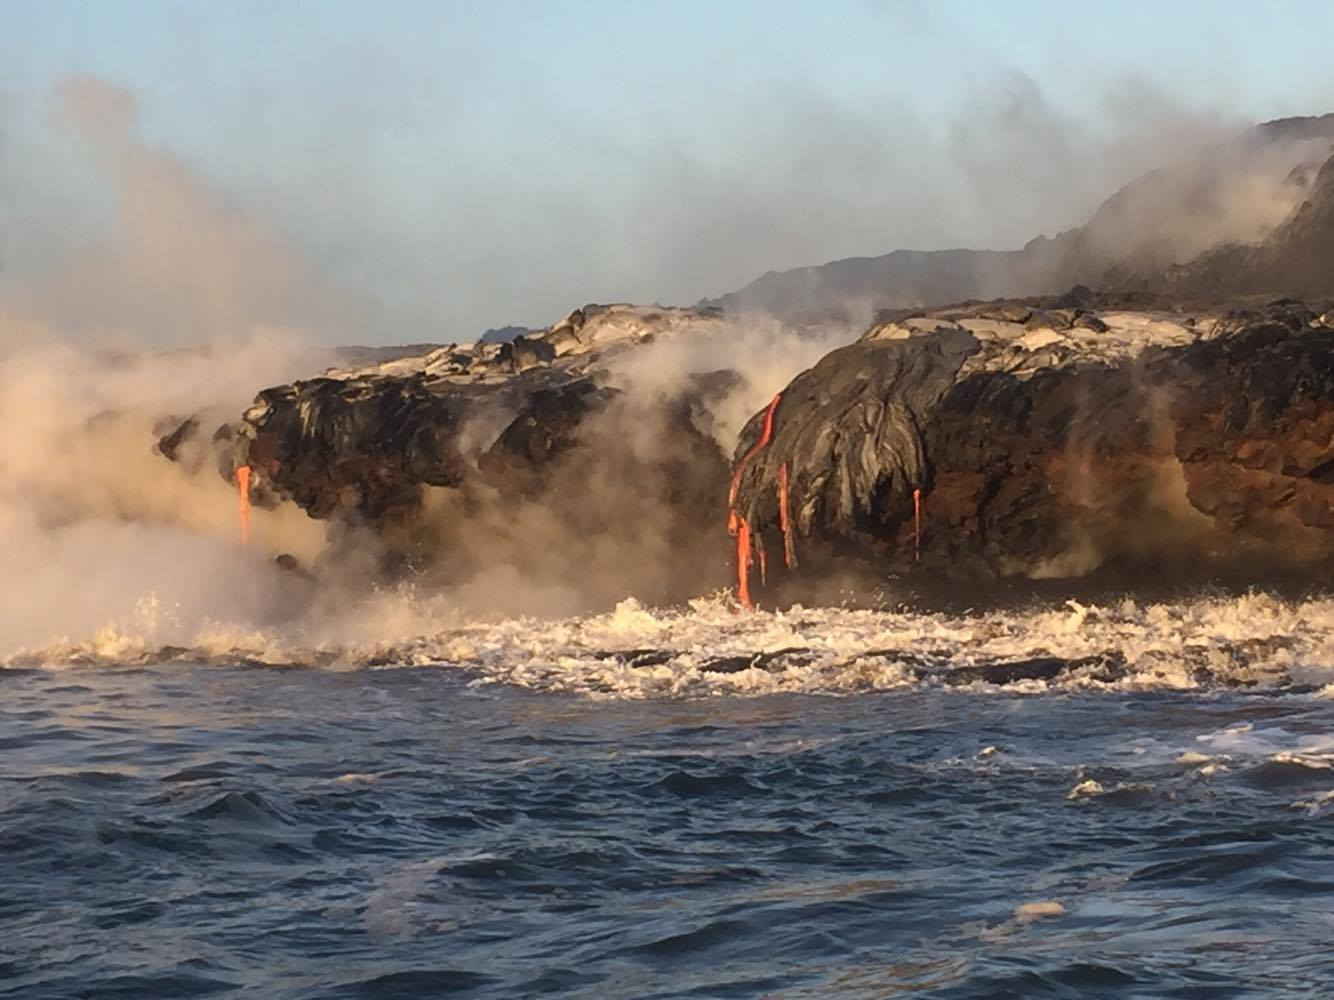 Kīlauea lava ocean entry, 10.13.16. PC: Robin Pilus.